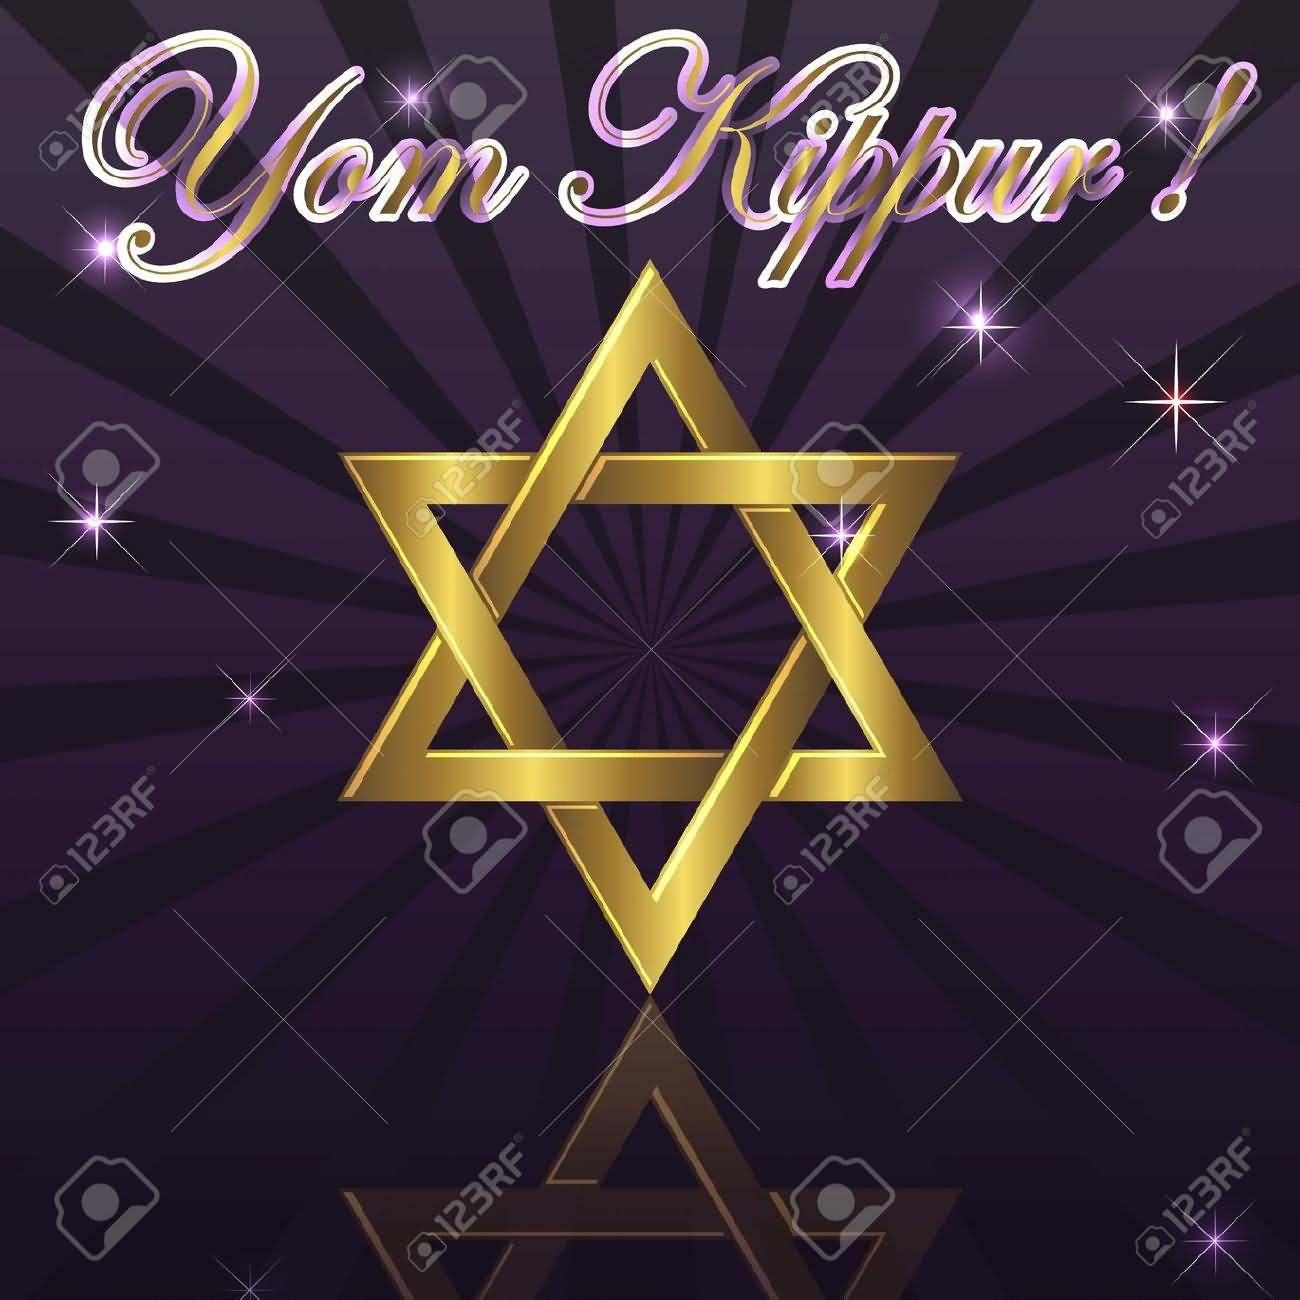 40 Amazing Yom Kippur Greeting Ideas On Askideas